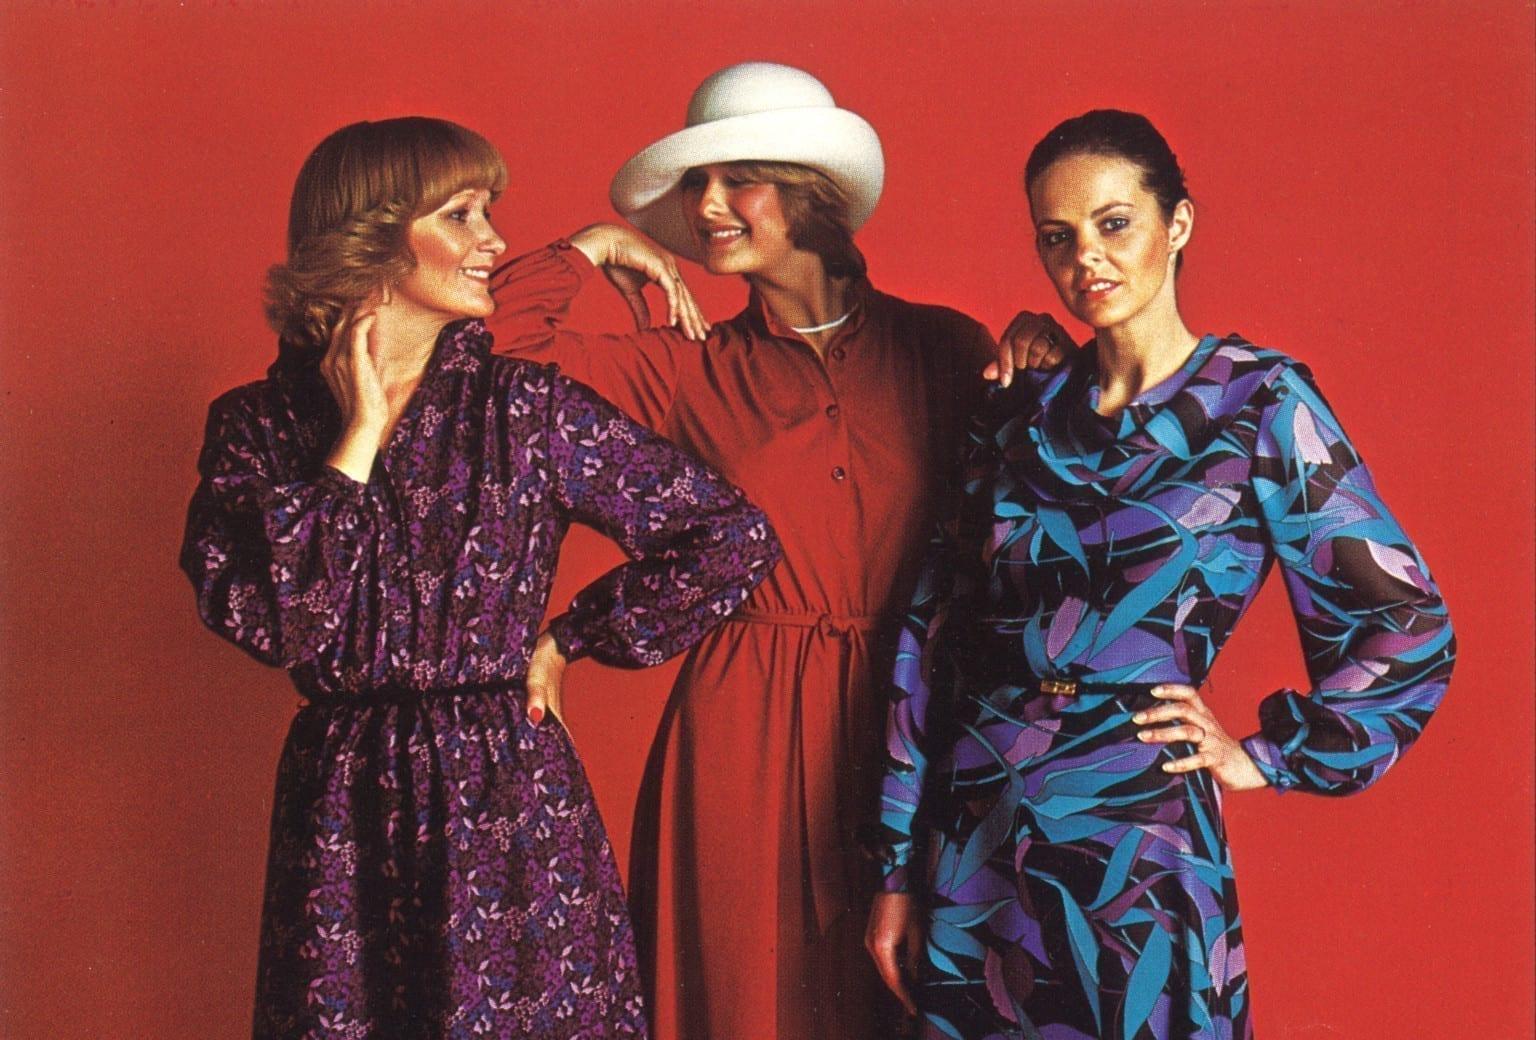 Historisk modeshow og popup butik med Magpie Lane på Tekstilmuseet